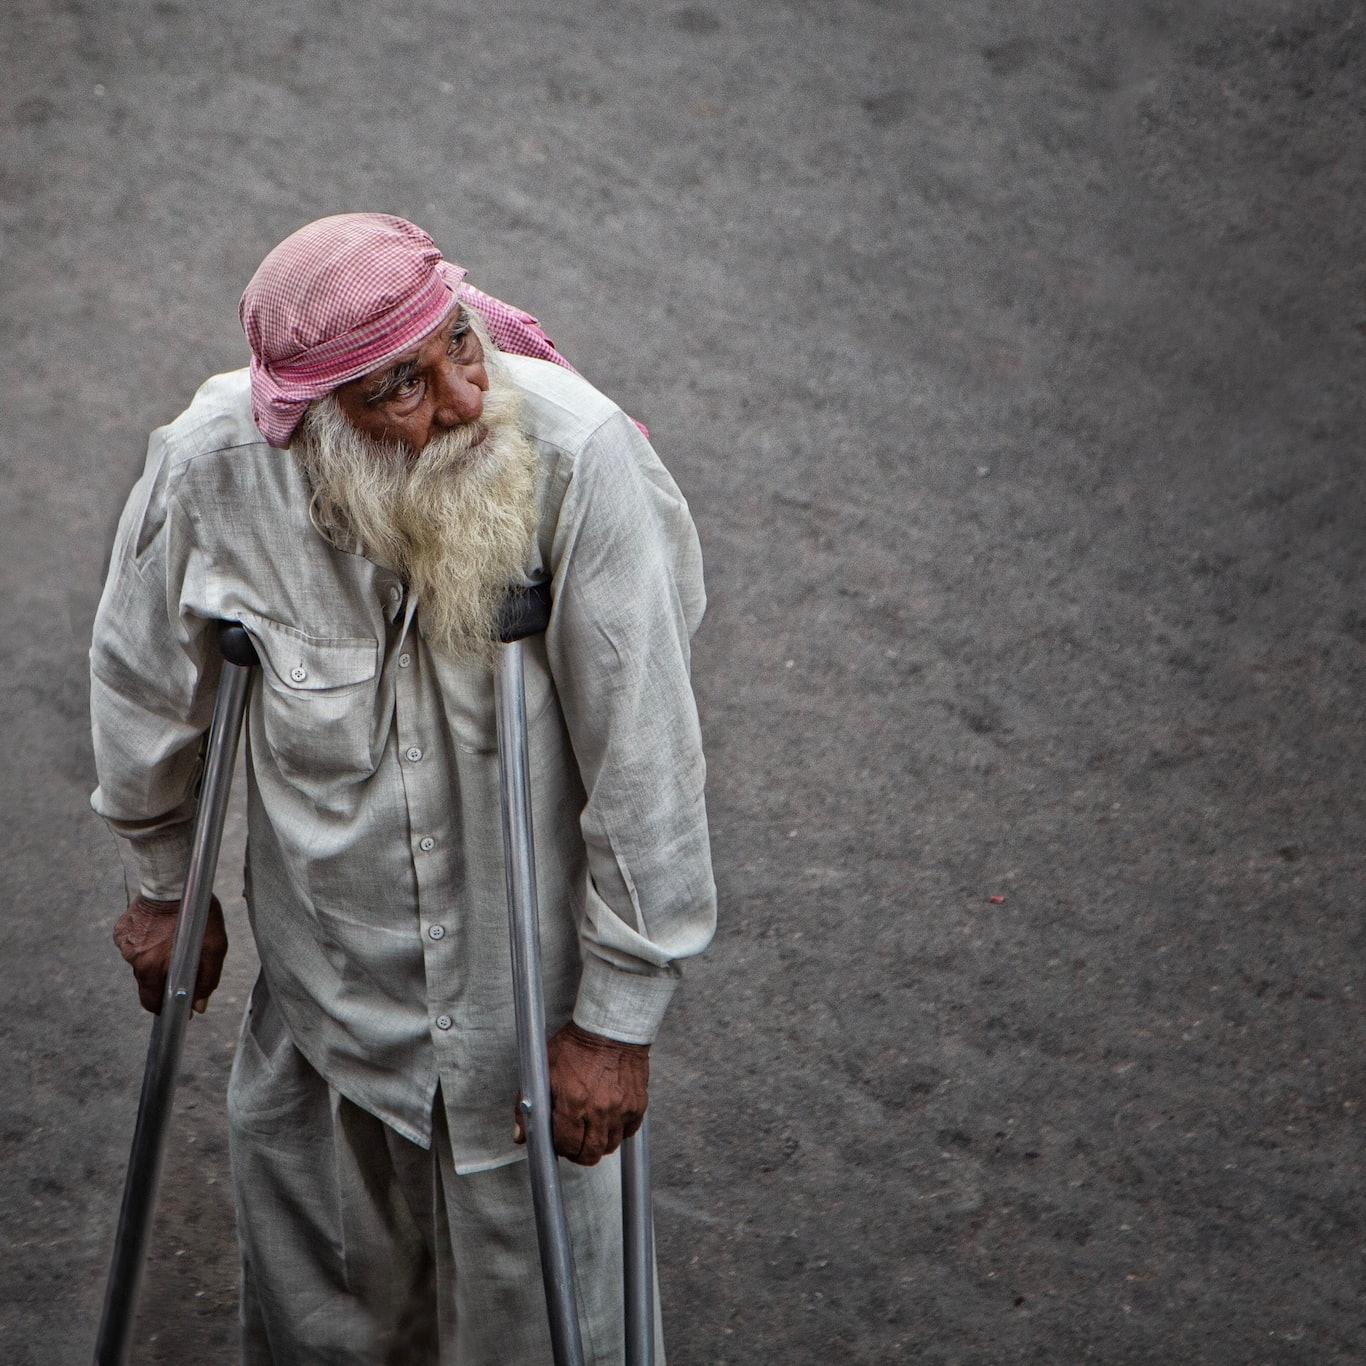 man in dress shirt using axilliary crutches